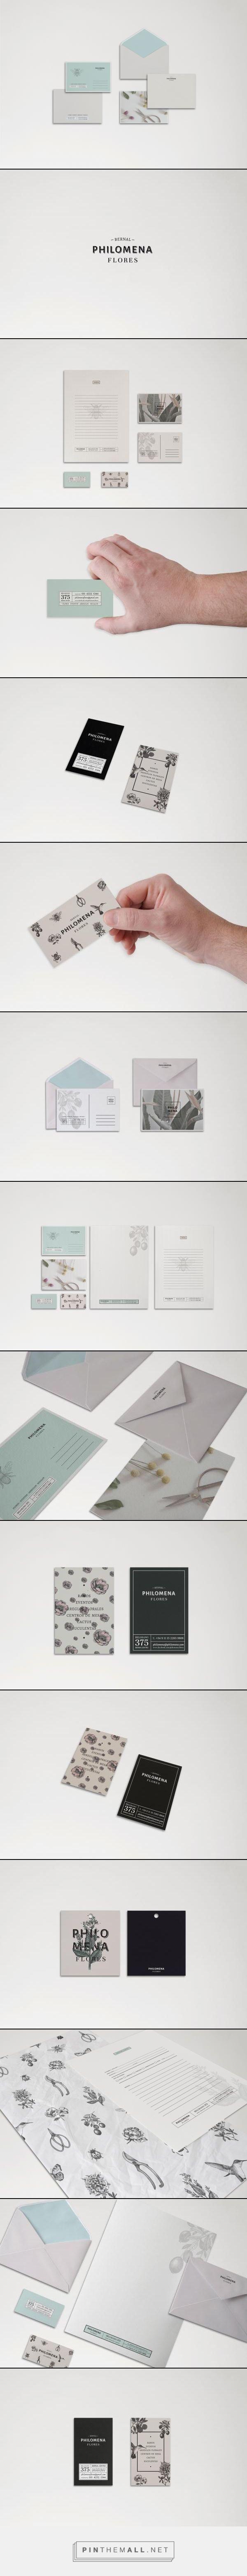 Philomena Flores - Buenos Aires - Argentina by Estudio Piropo © #graficdesign - created via http://pinthemall.net #design #identity #diseñografico #identidad